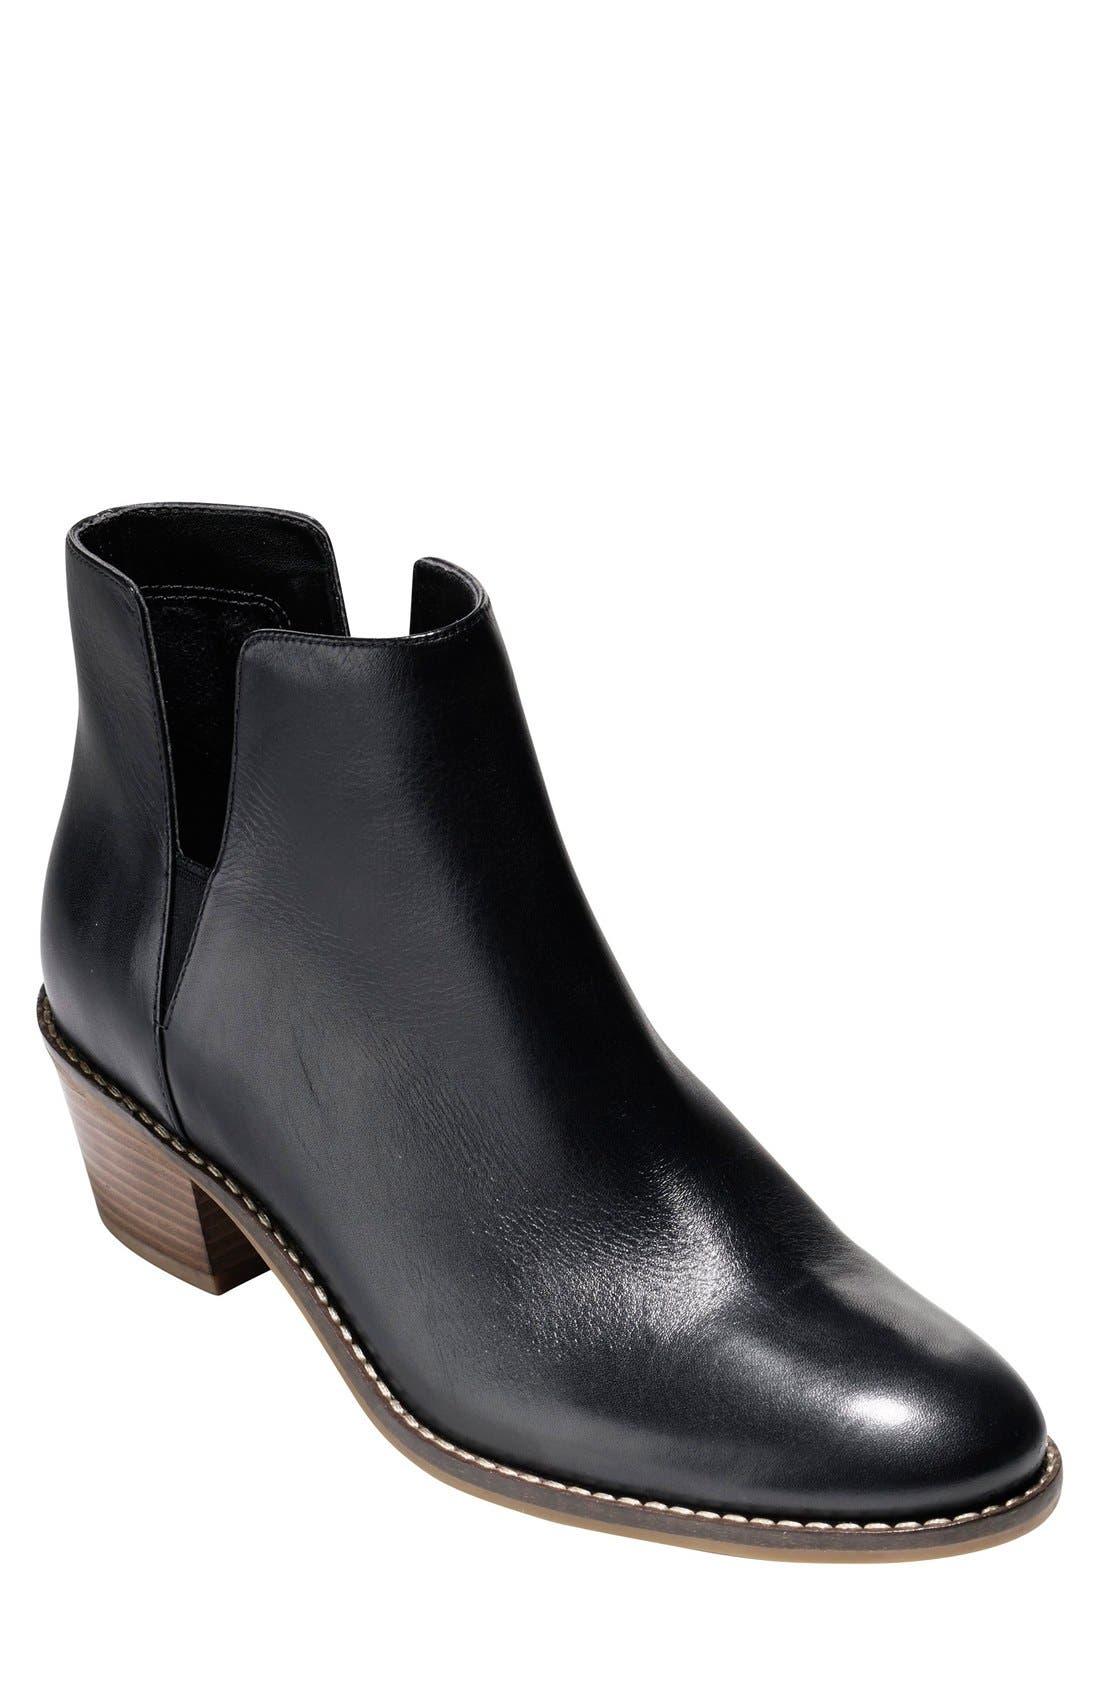 Main Image - Cole Haan 'Abbot' Chelsea Boot (Women)